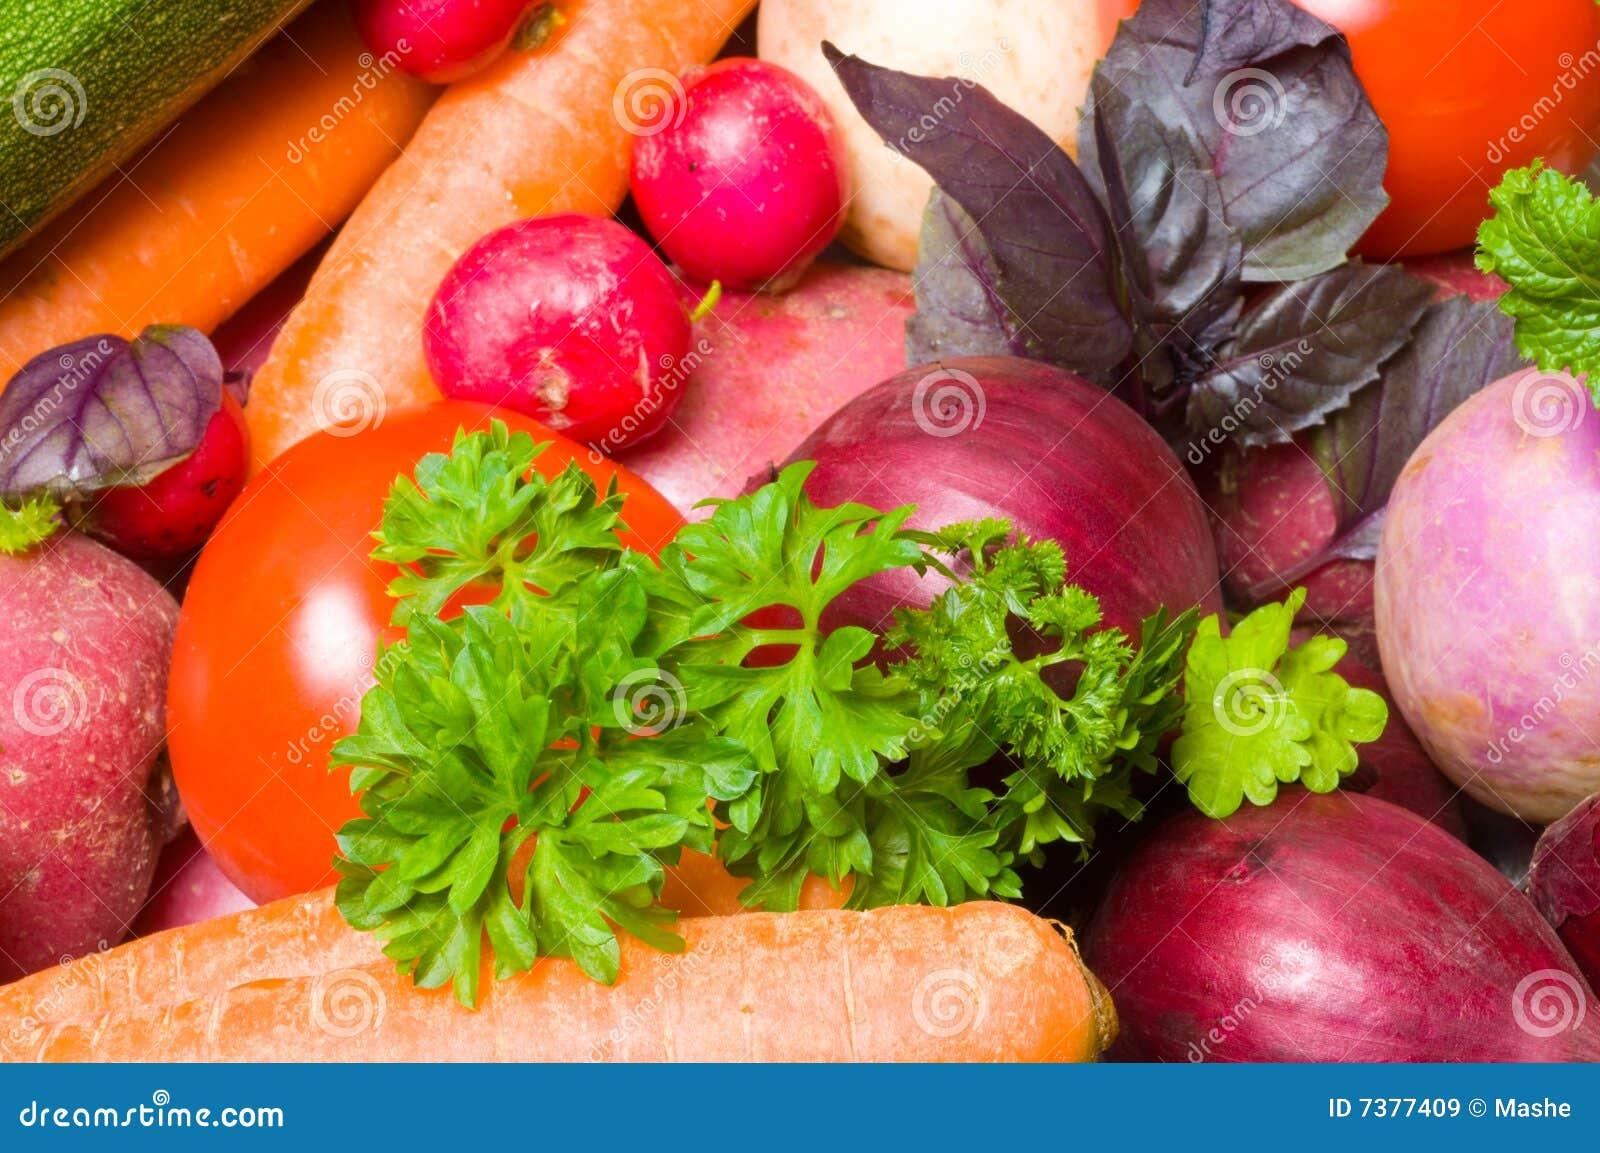 Fresh beautiful vegetables royalty free stock images for Beautiful vegetables